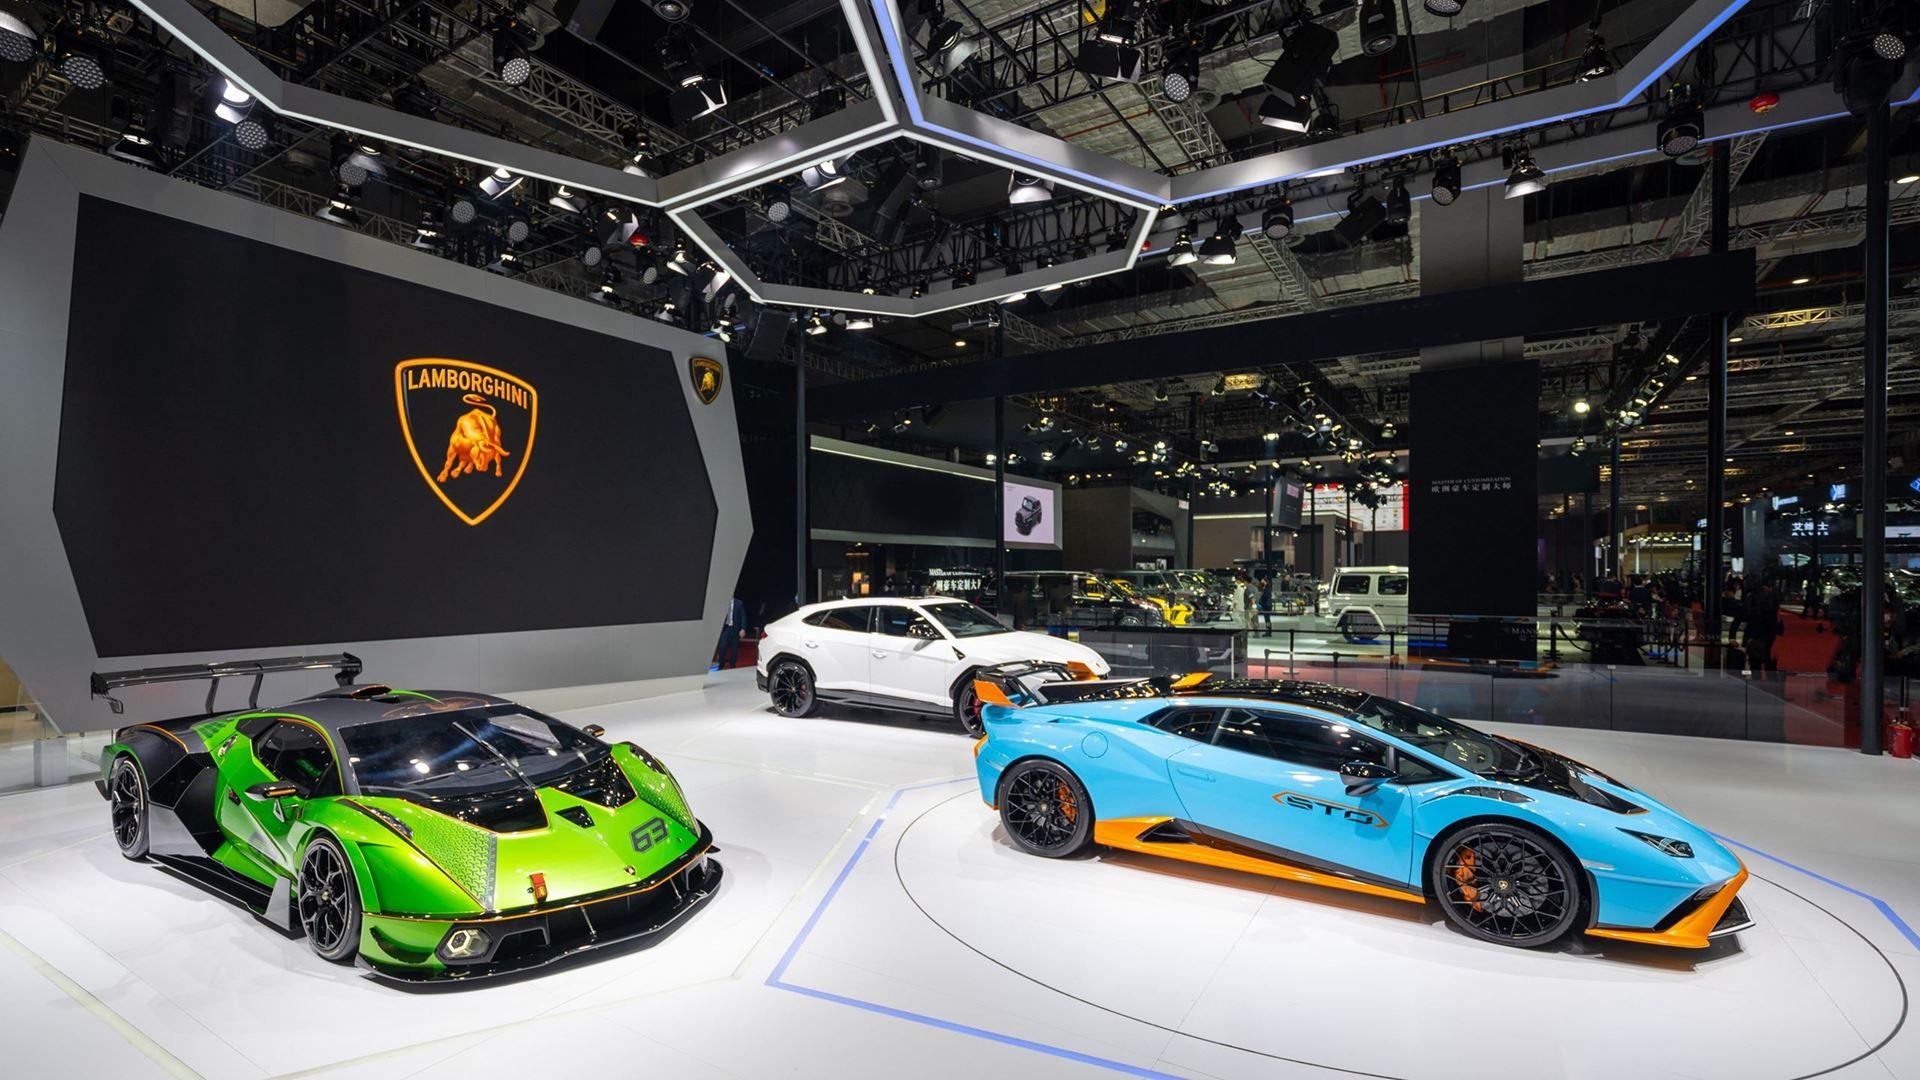 Three premieres for Automobili Lamborghini at the 2021 Shanghai Auto Show - Image 6